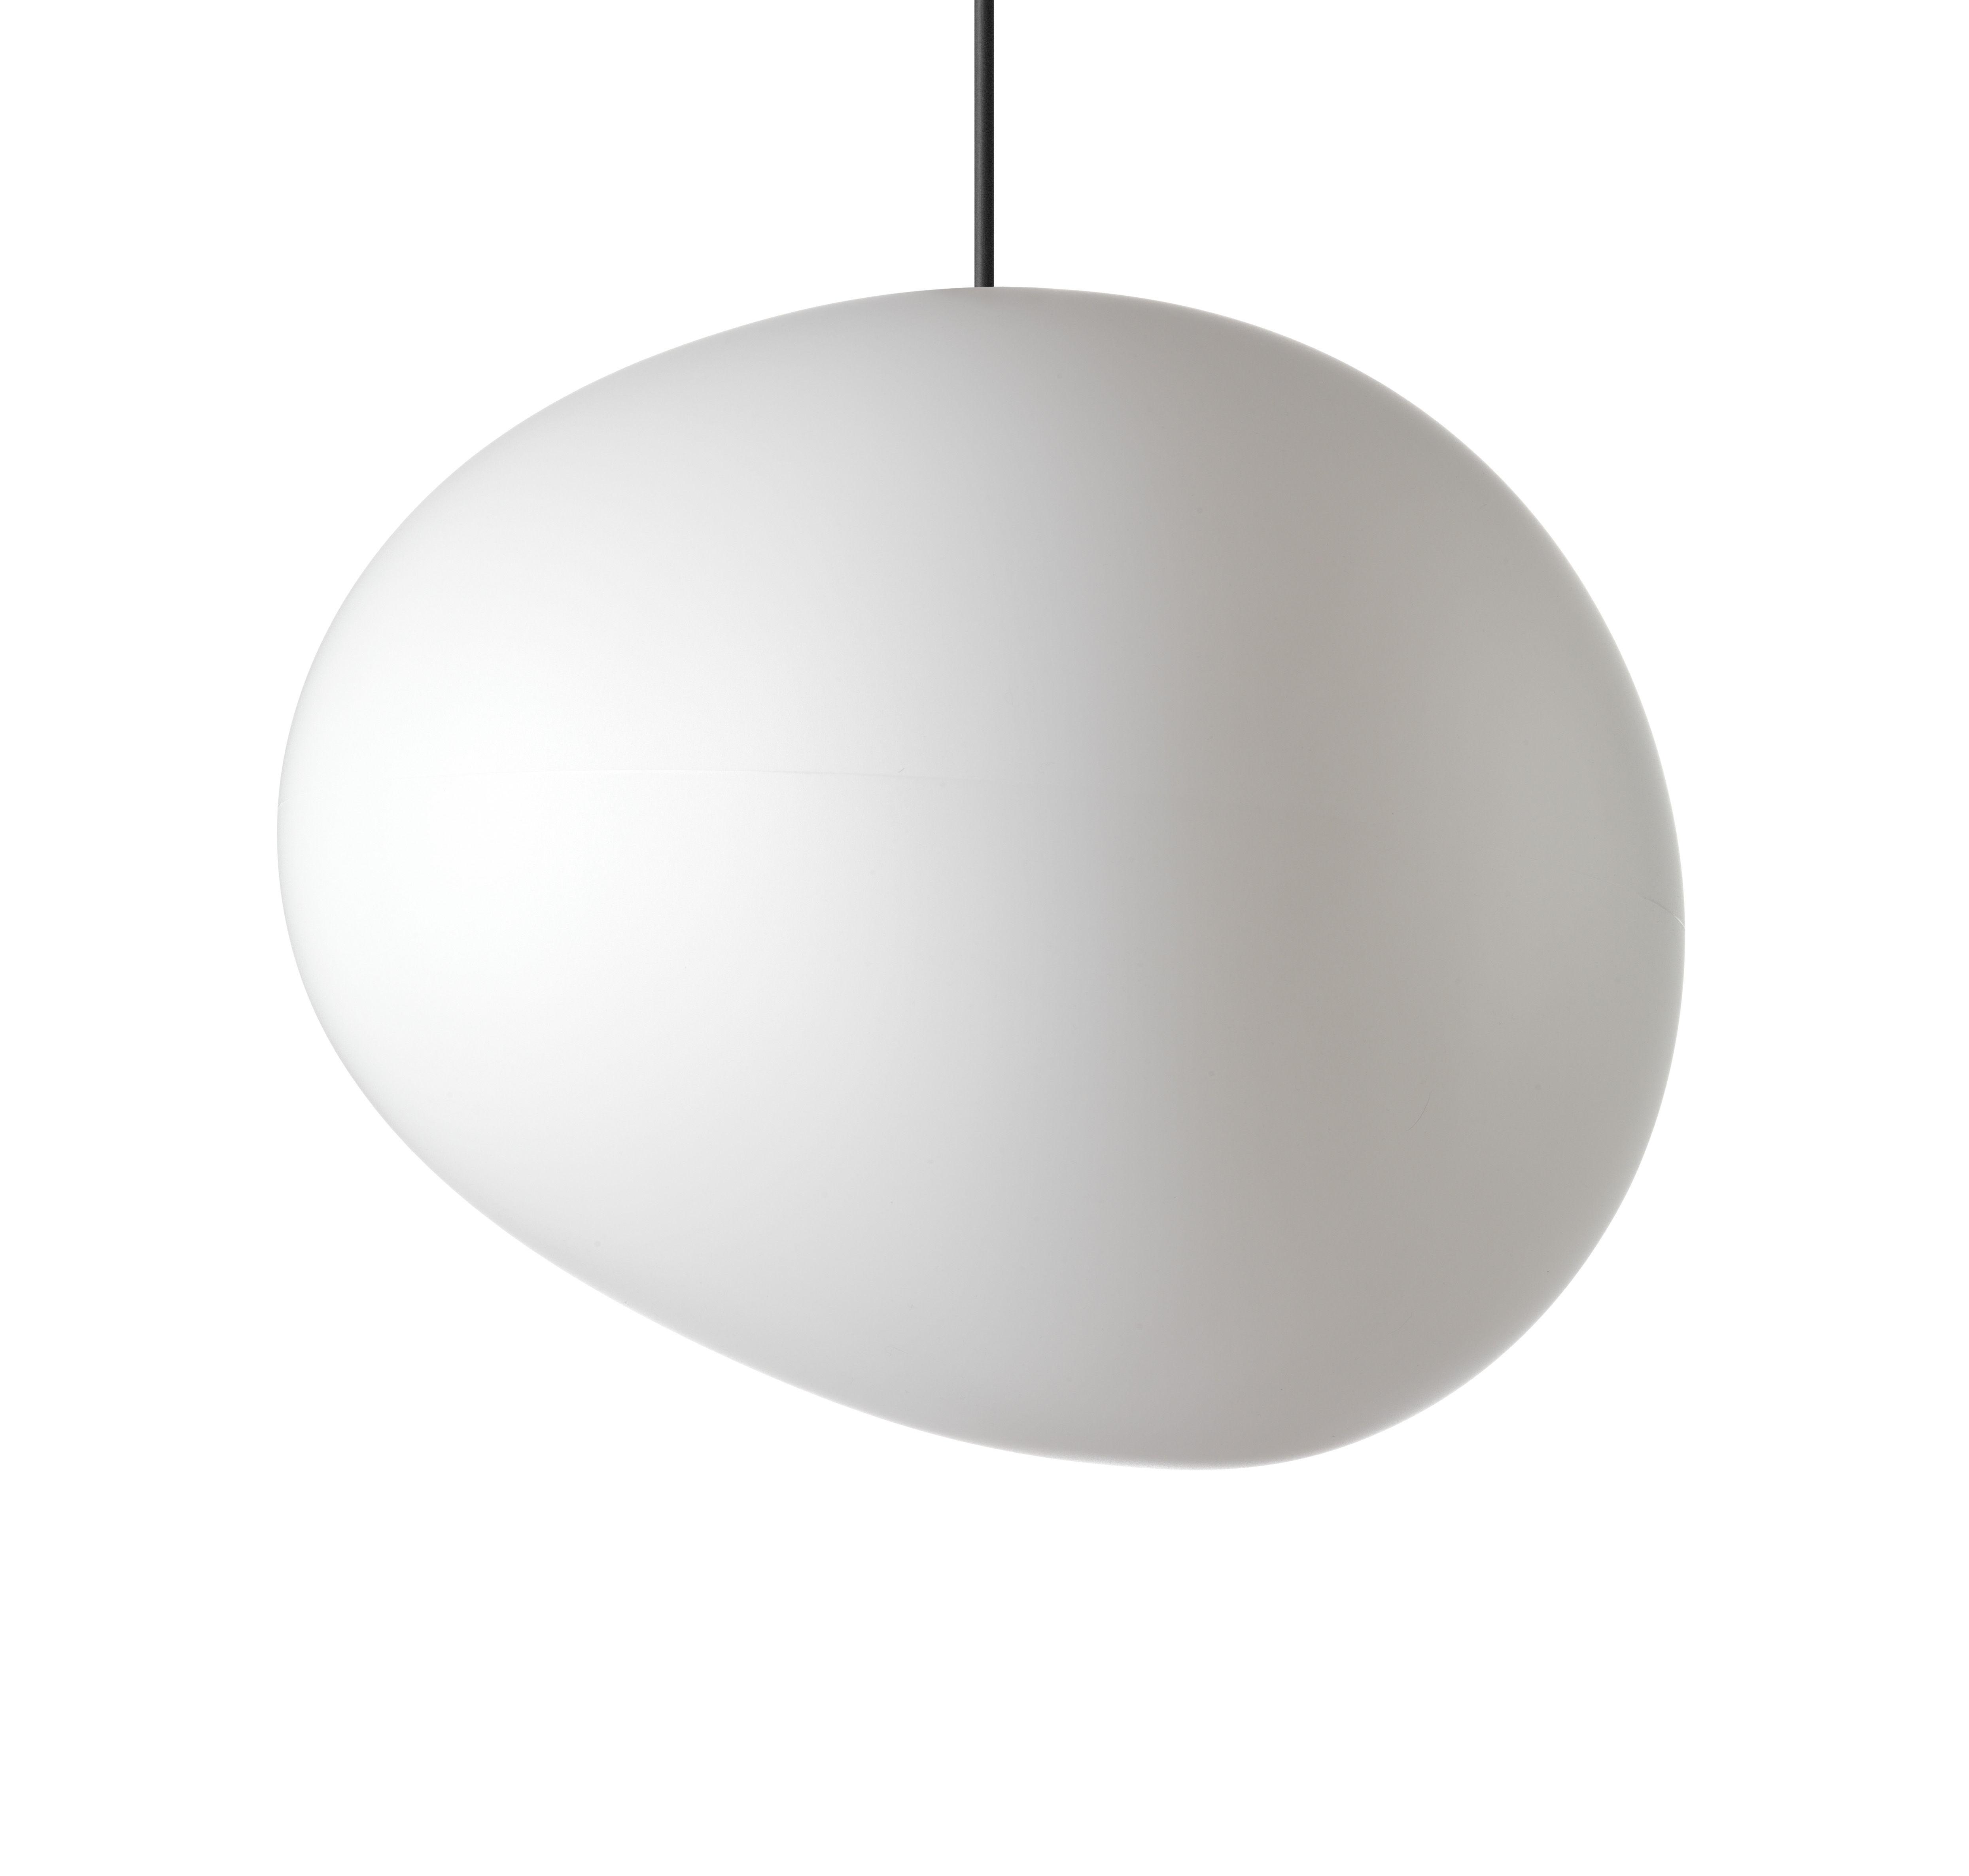 Lighting - Pendant Lighting - Gregg Outdoor Grande Pendant - L 46 cm by Foscarini - Grande / L 46 cm - White - Polythene